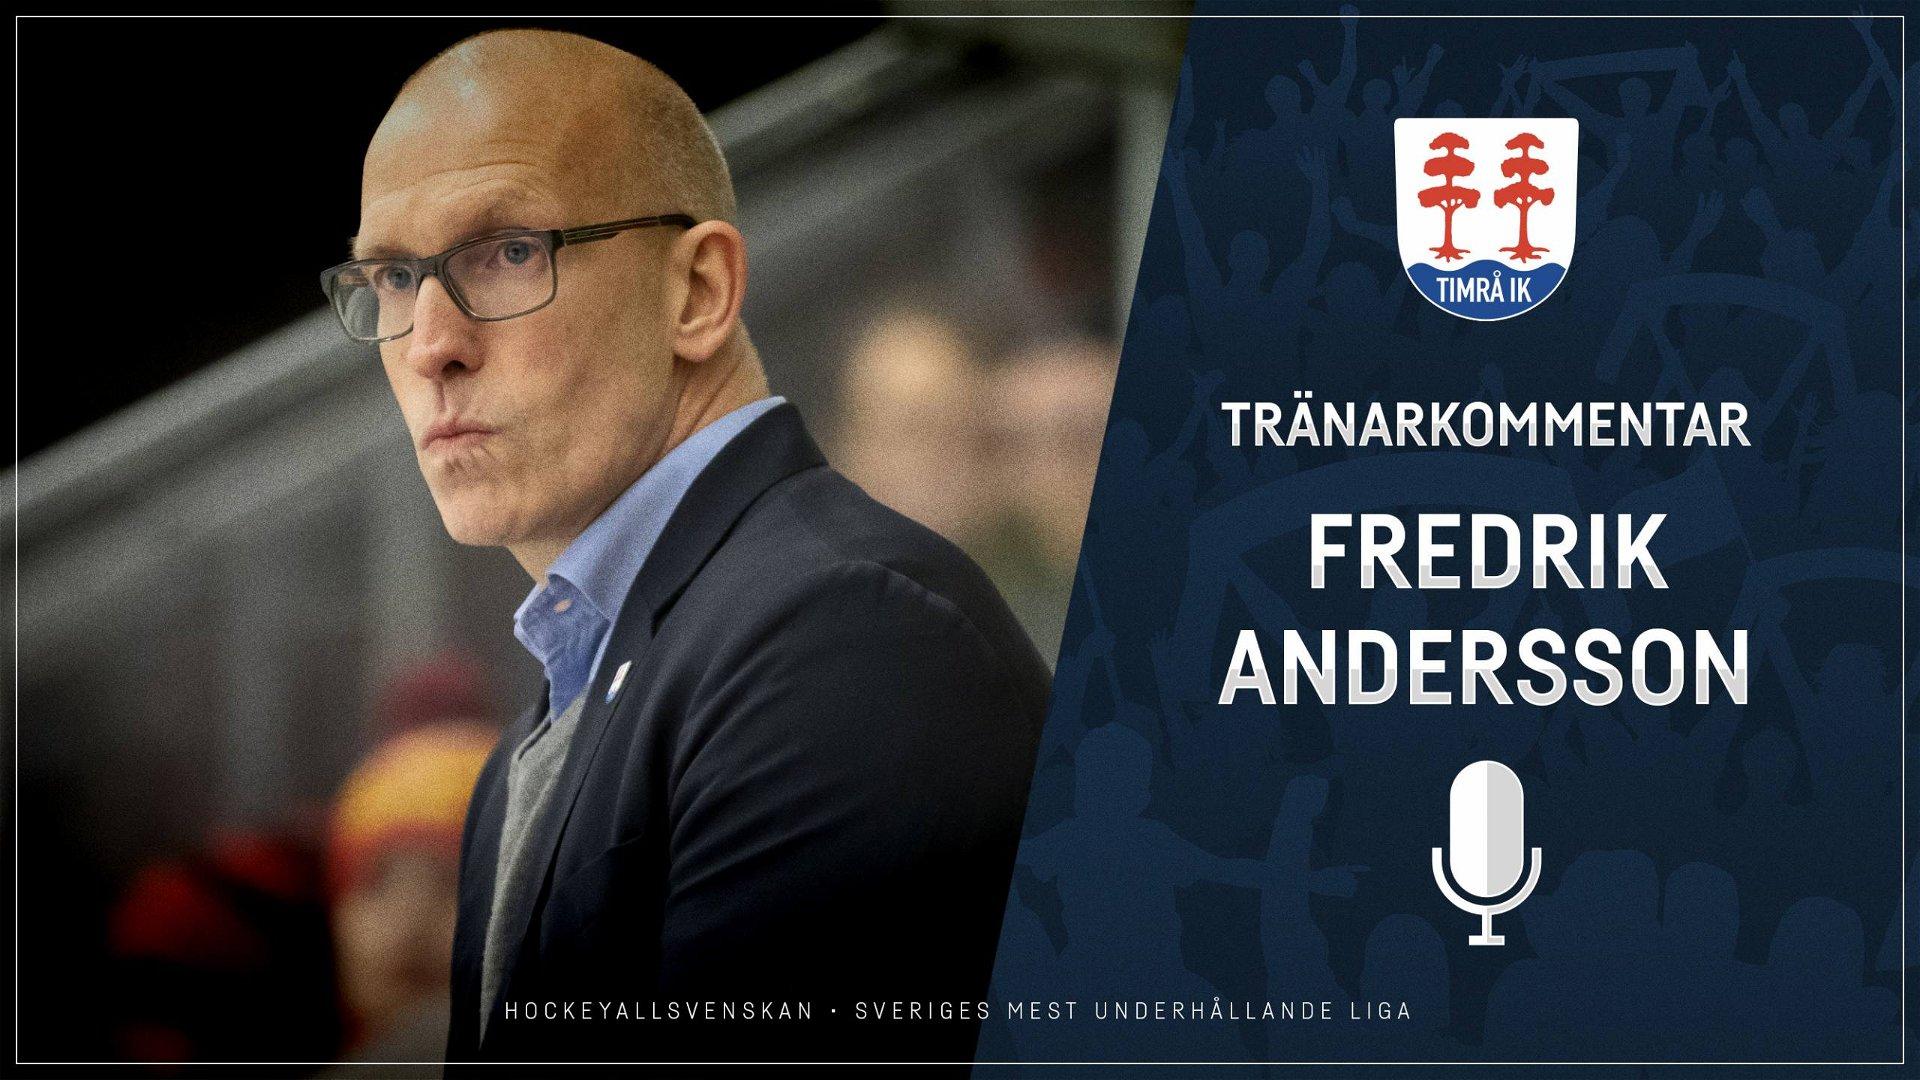 2020-12-03 Segerintervju: Fredrik Andersson, Timrå